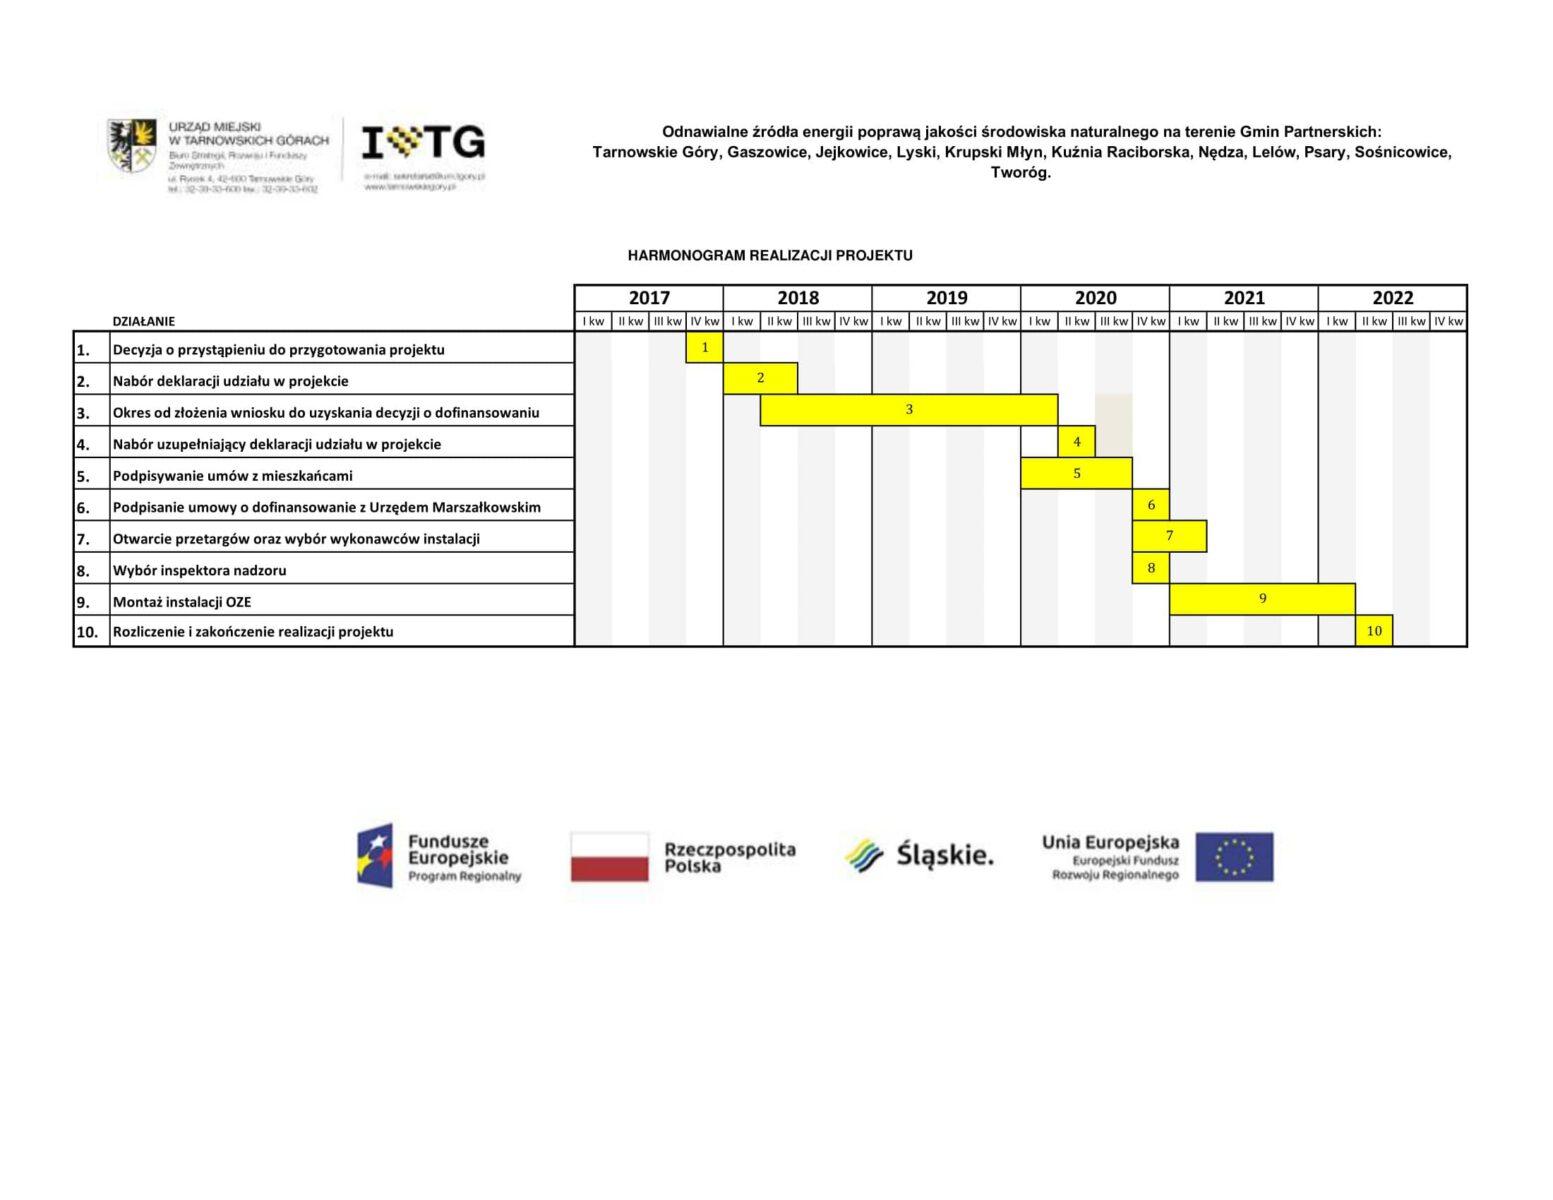 Tabela Harmonogram realizacji projektu OZE